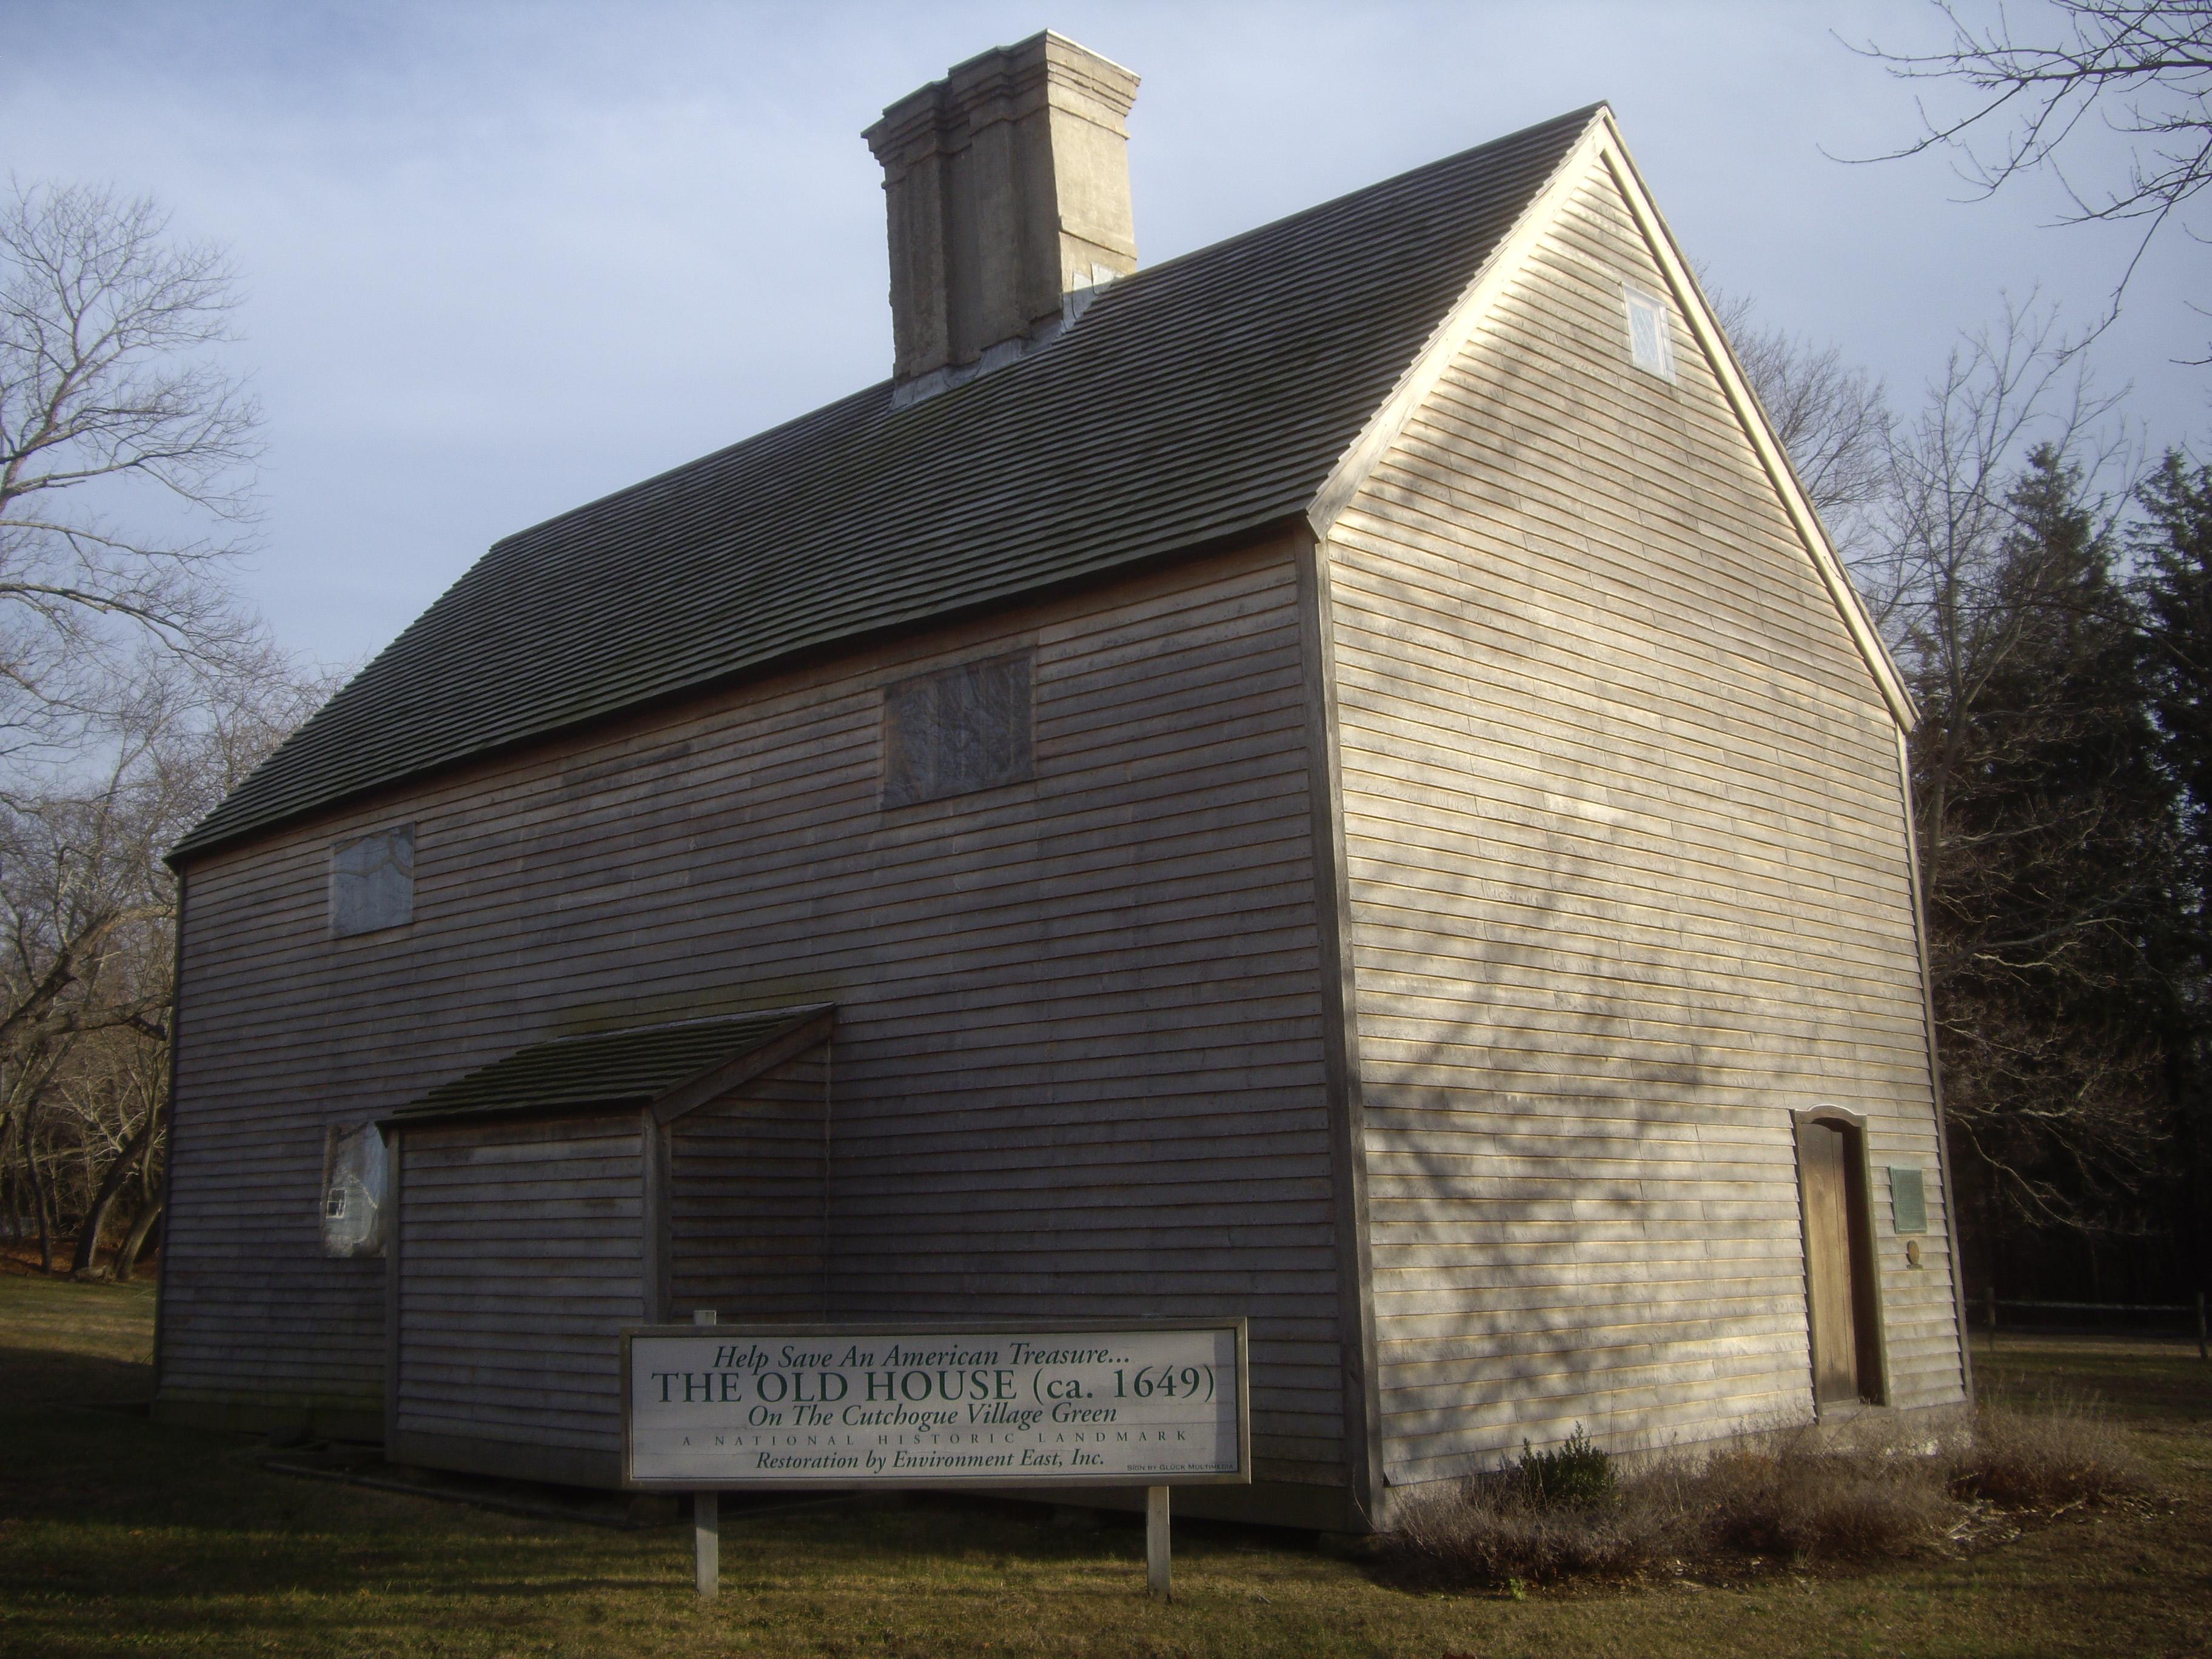 Old House Cutchogue Wikipedia